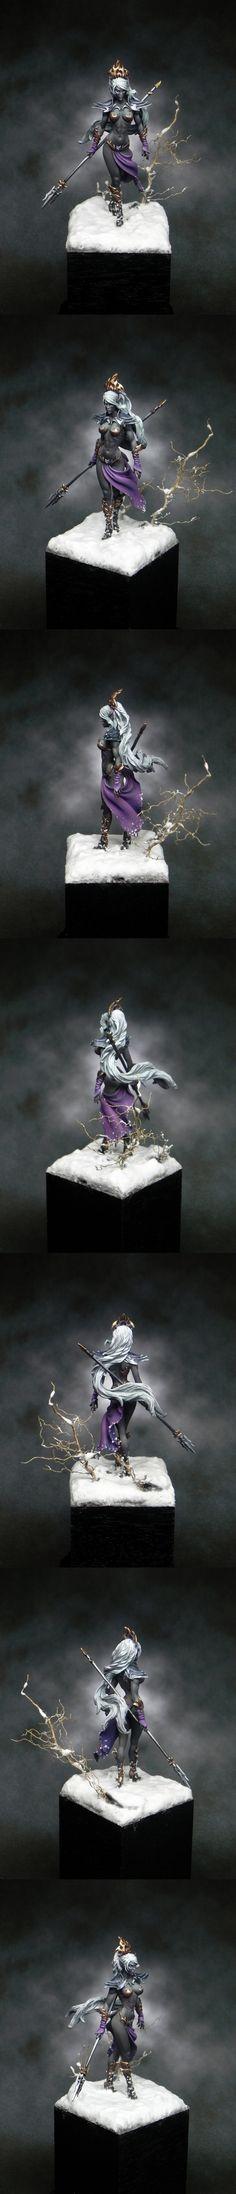 CoolMiniOrNot - Luaayne the Drow Sorceress by Samuedio